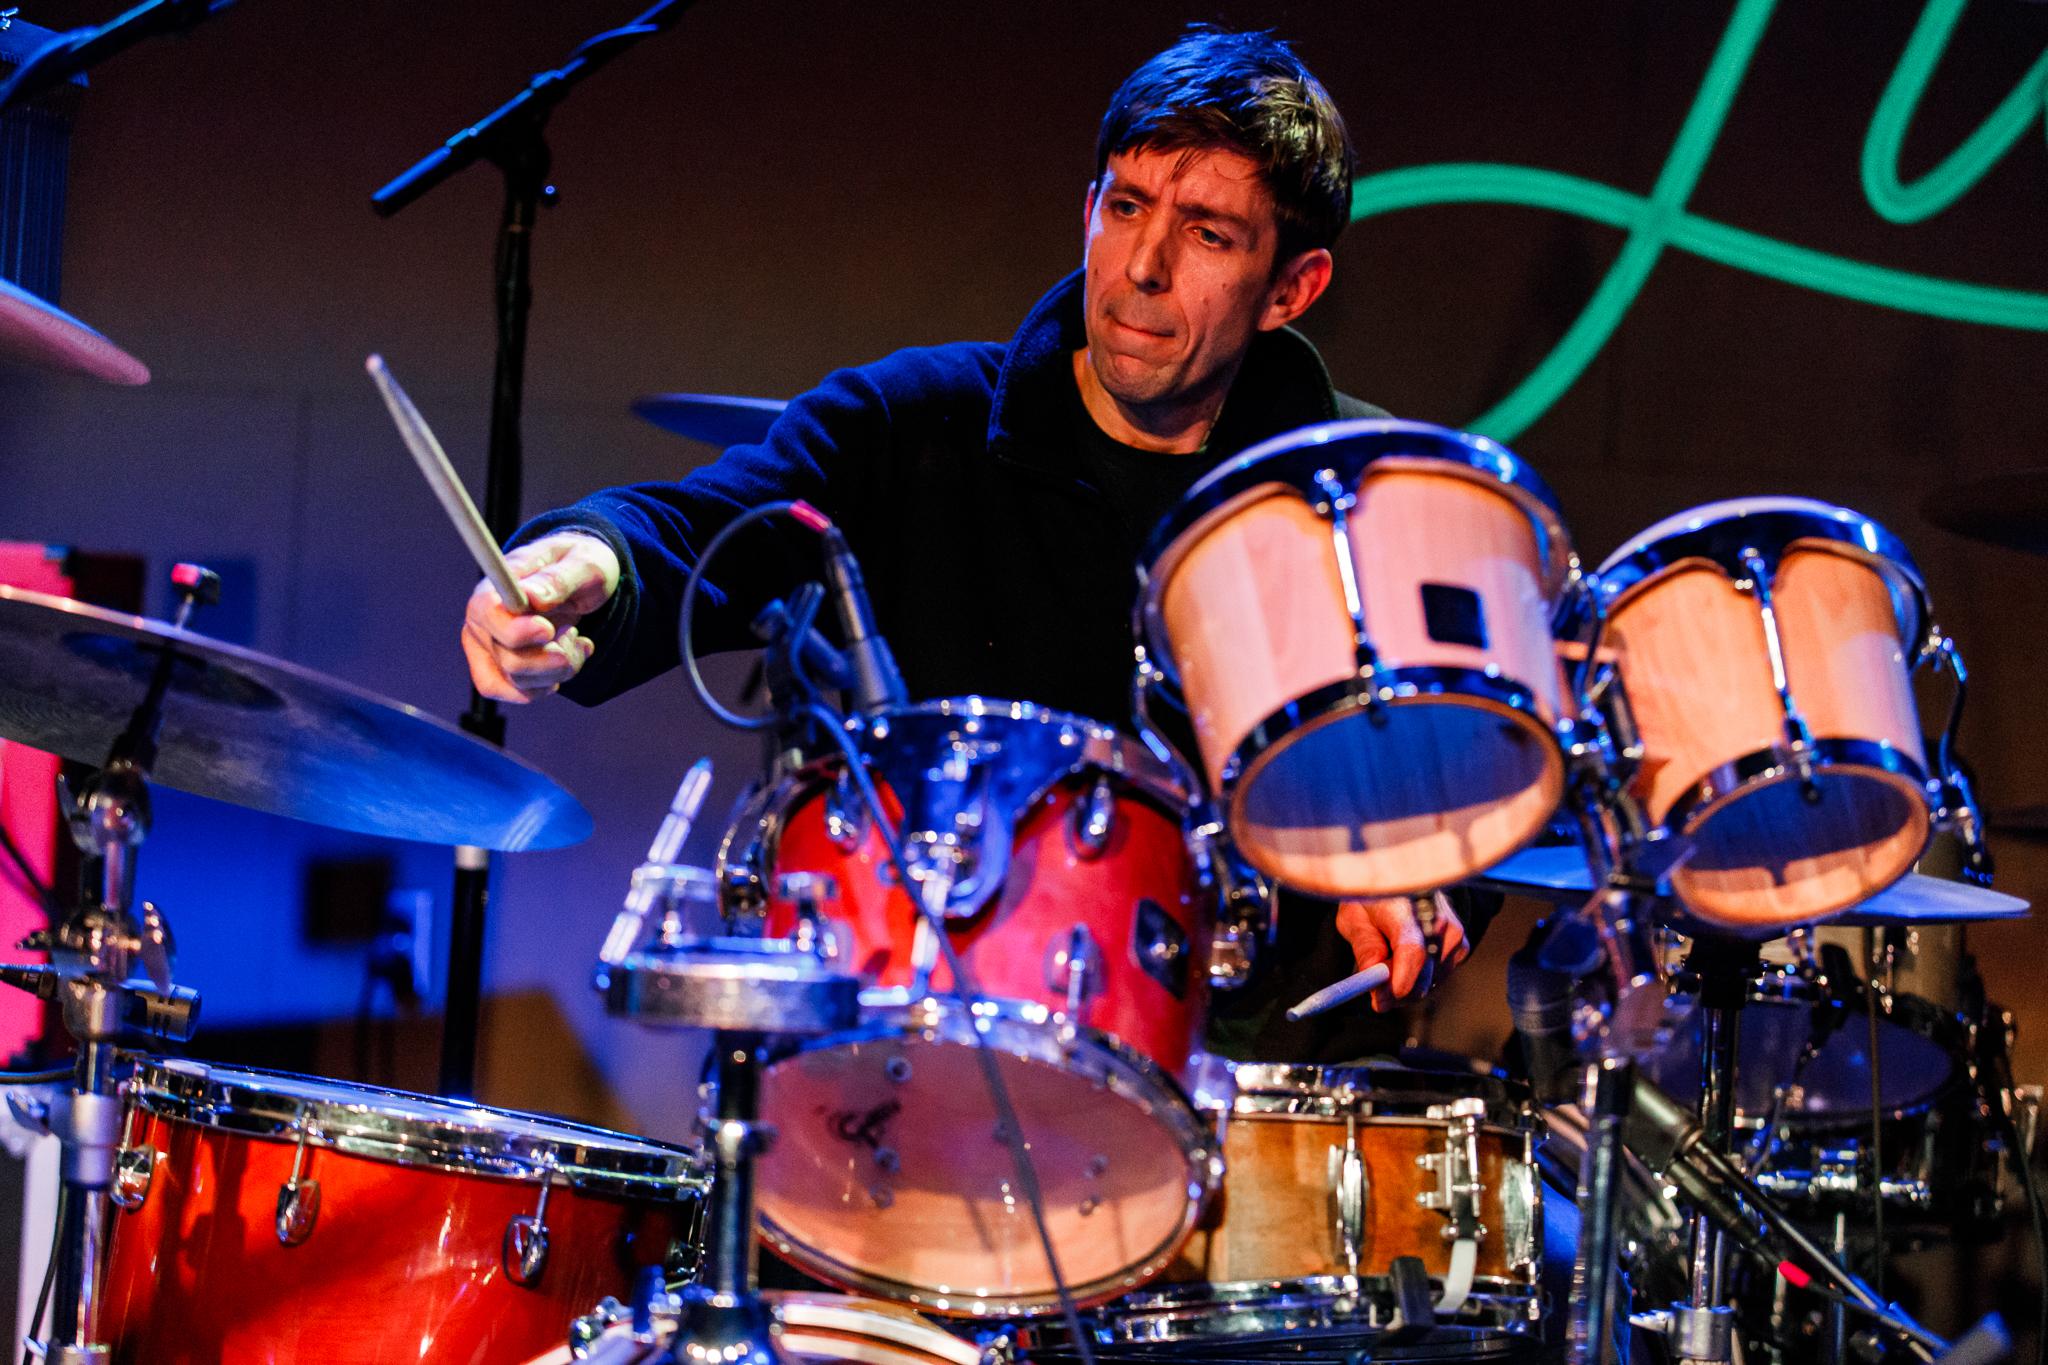 Thrushes performing at The Hamilton in Washington, DC - 6/16/2018 (photo by Matt Condon / @arcane93)